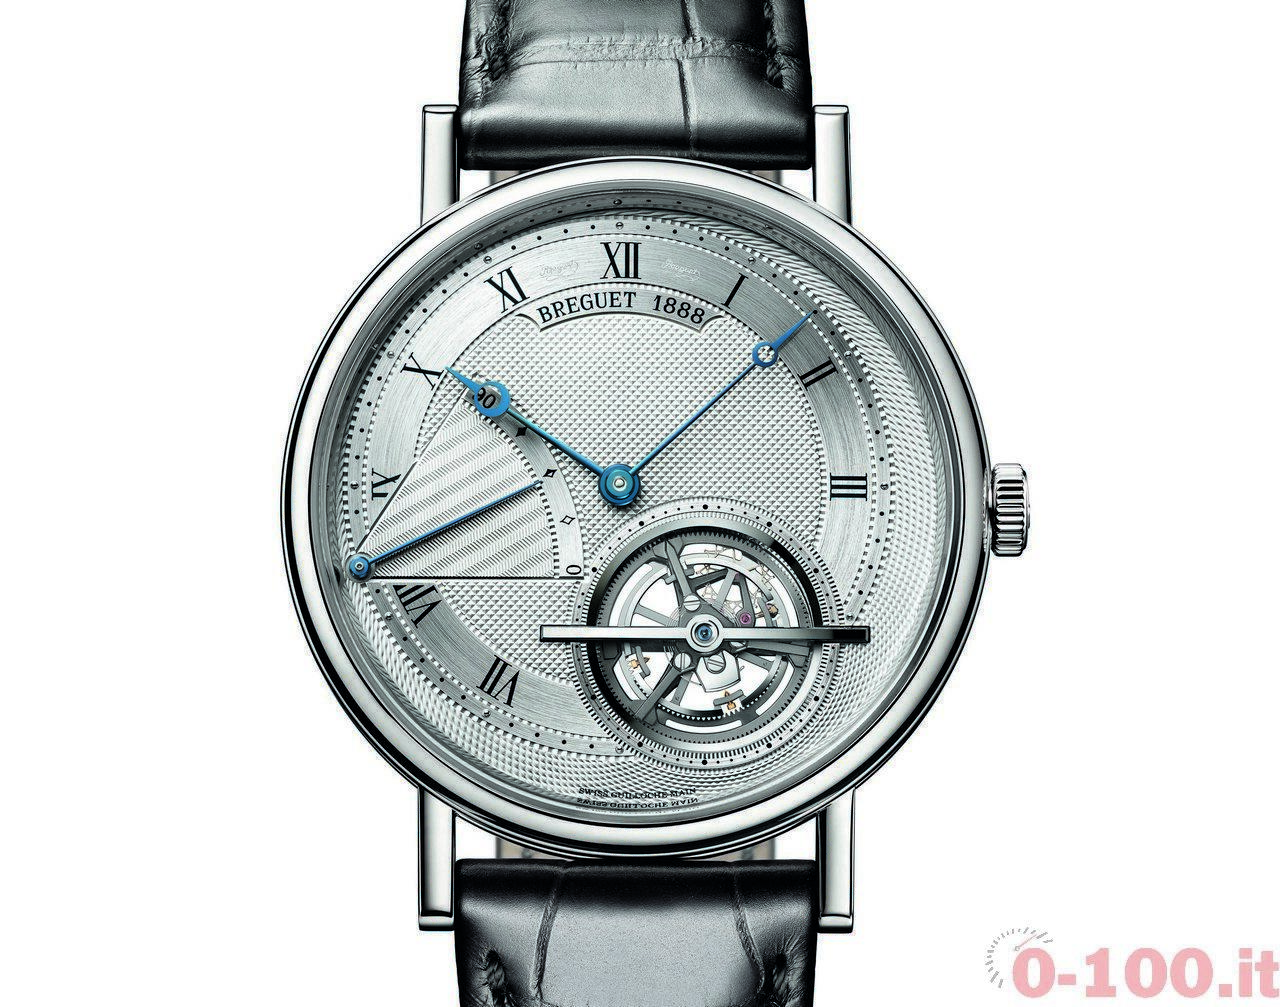 breguet-classique-grande-complication-tourbillon-extra-plat-ref-5377-baselworld-2014_0-100_1